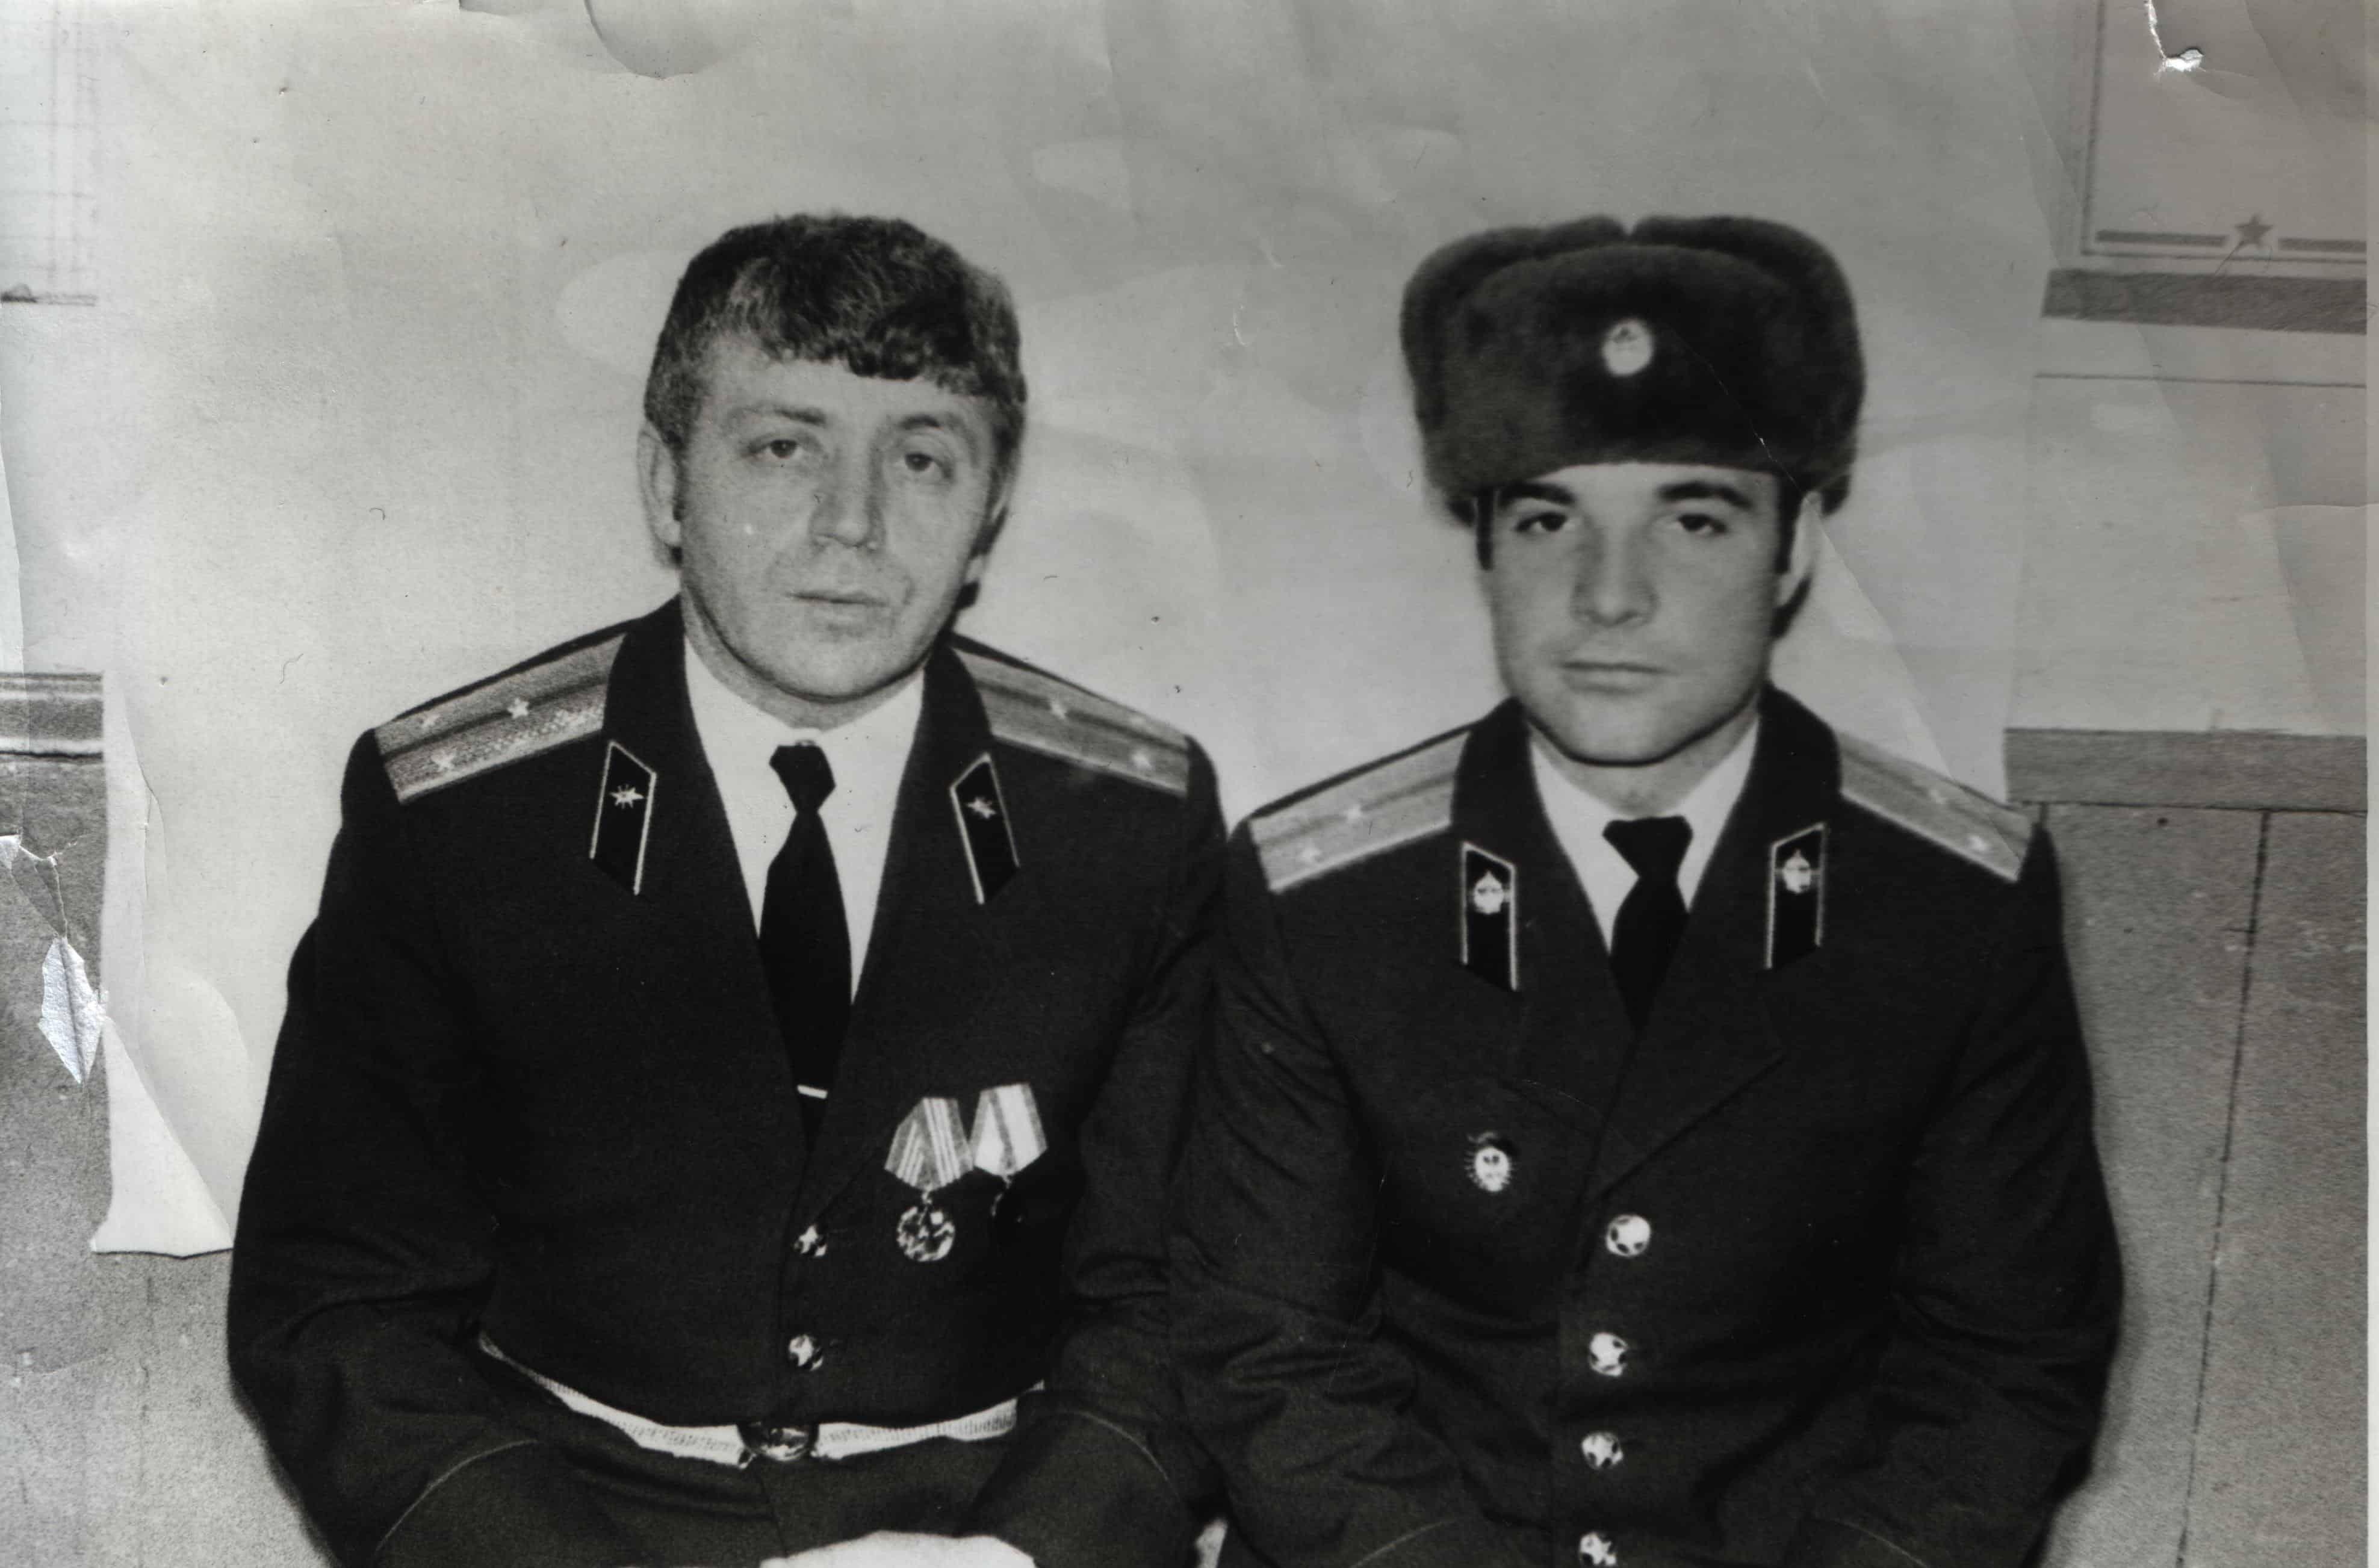 Старшие лейтенанты Лейдерман и Копейкин, 1983 год